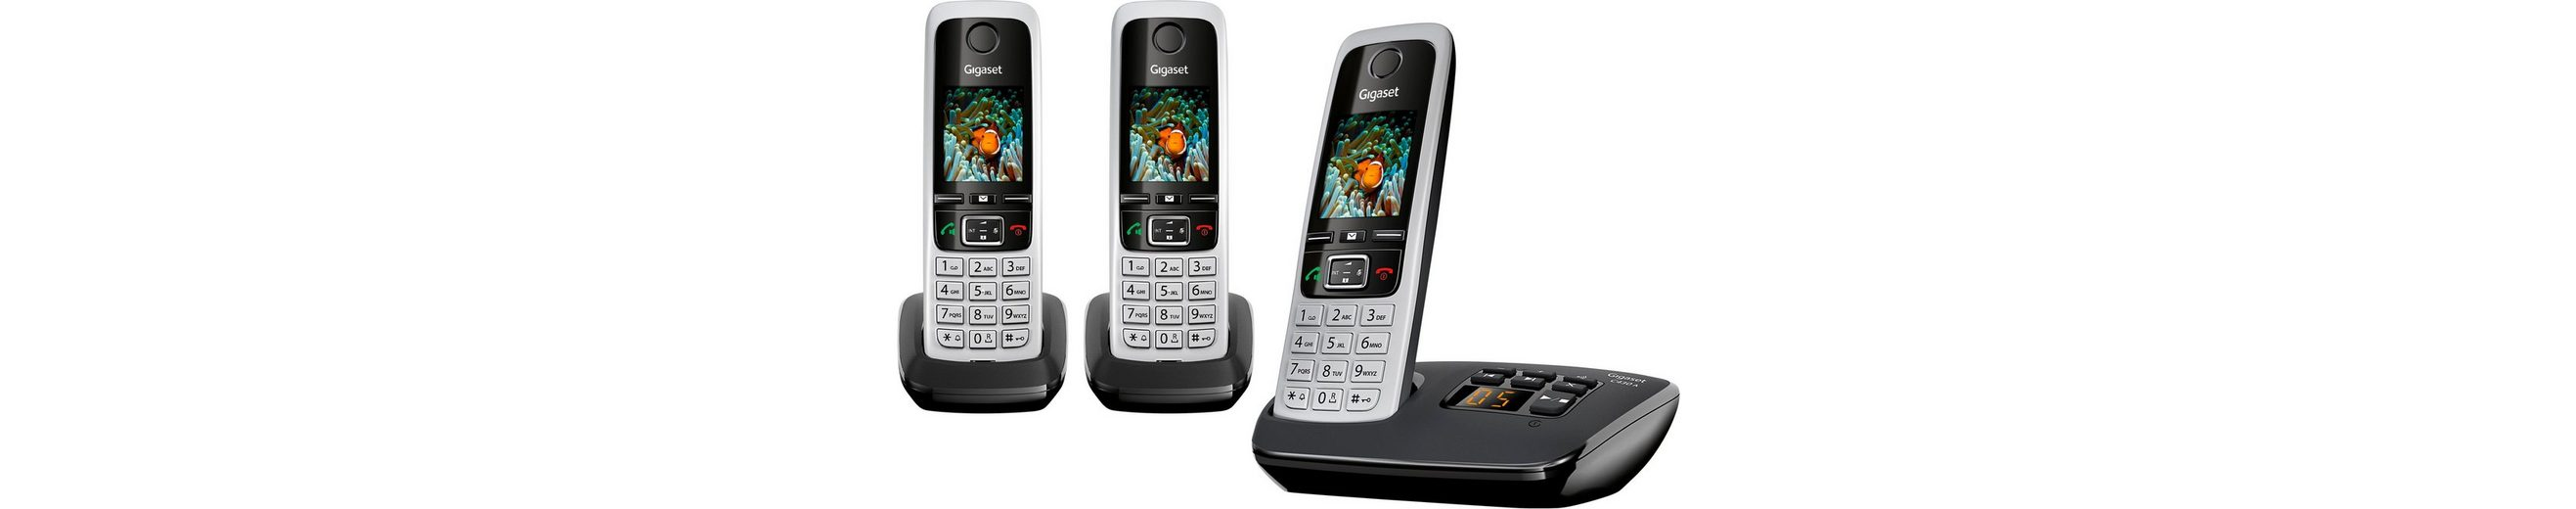 Gigaset C430 A TRIO Schnurloses DECT Telefon-Set mit AB